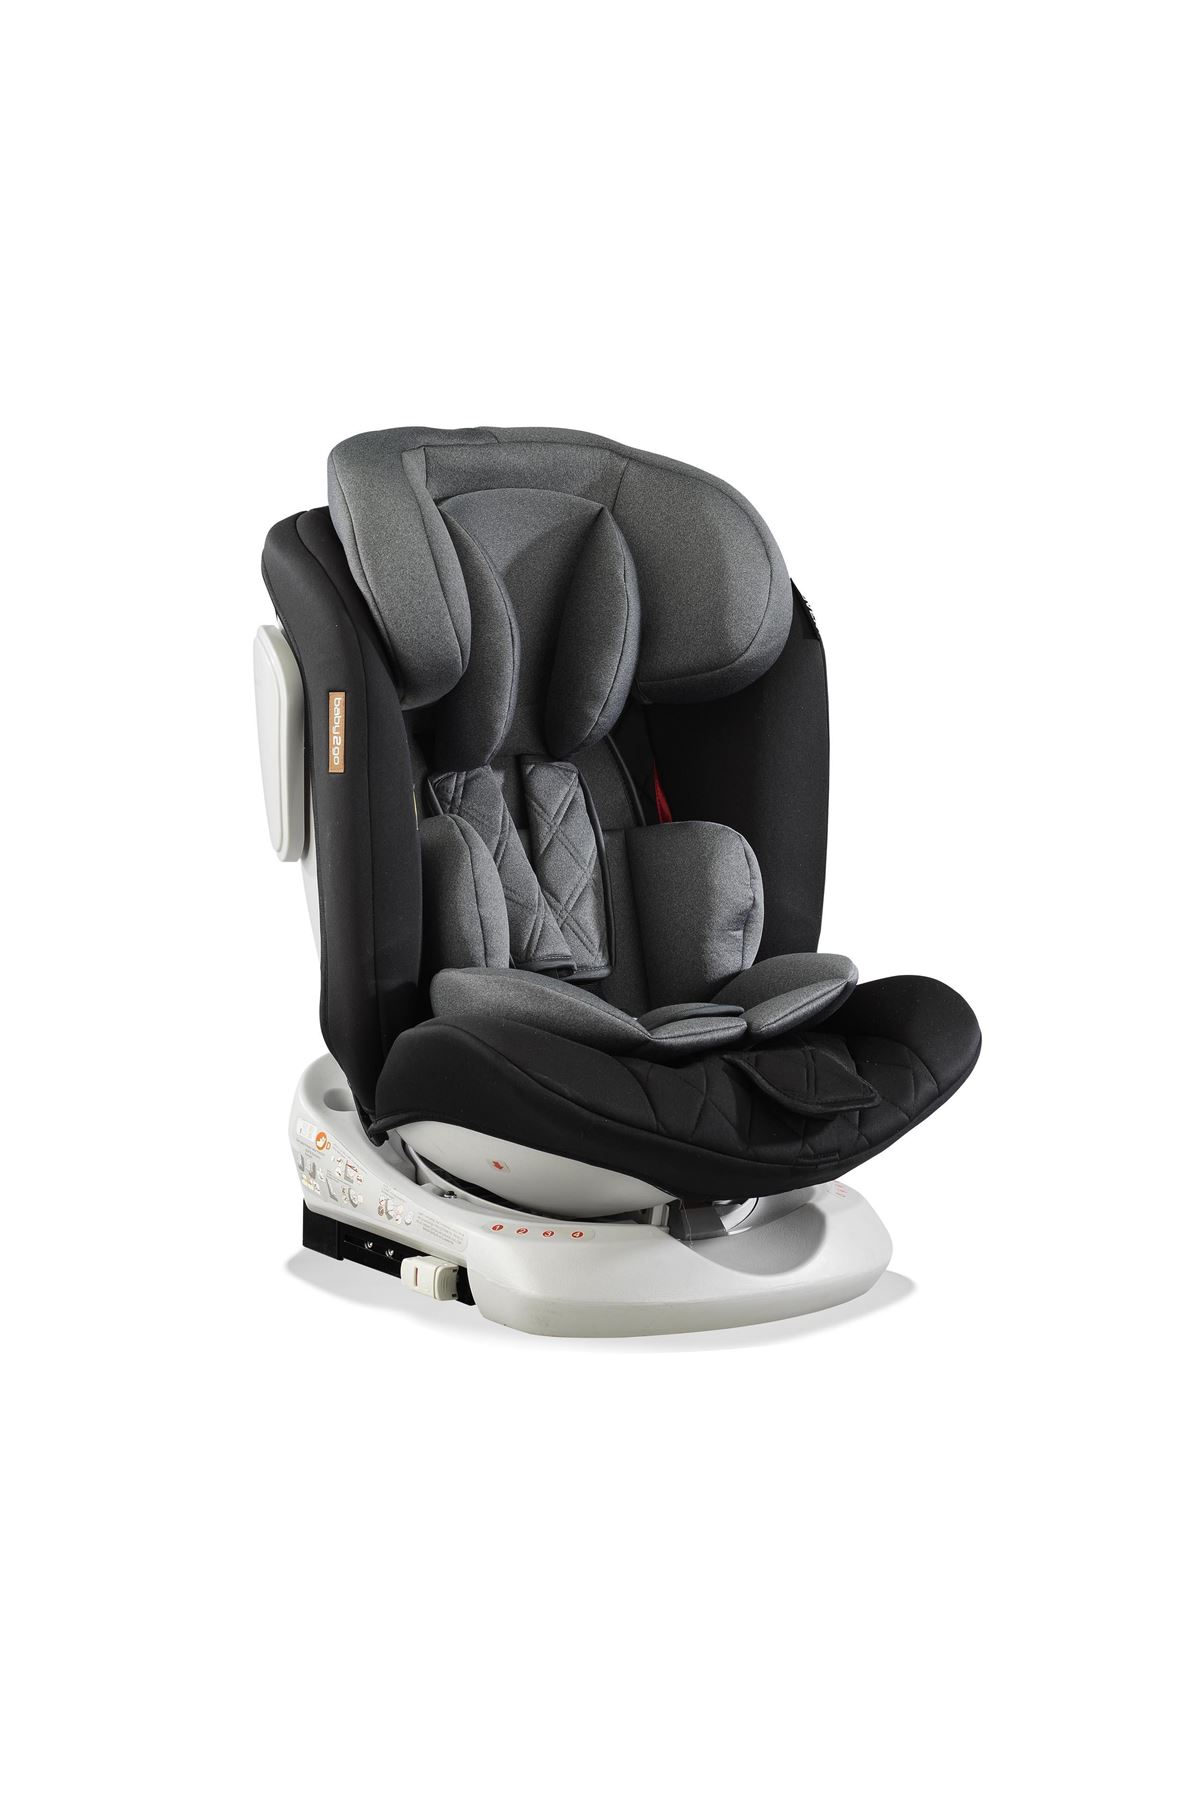 Baby2go Rover Plus İsofixli 0-36 Kg Oto Koltuğu 2061 Gri